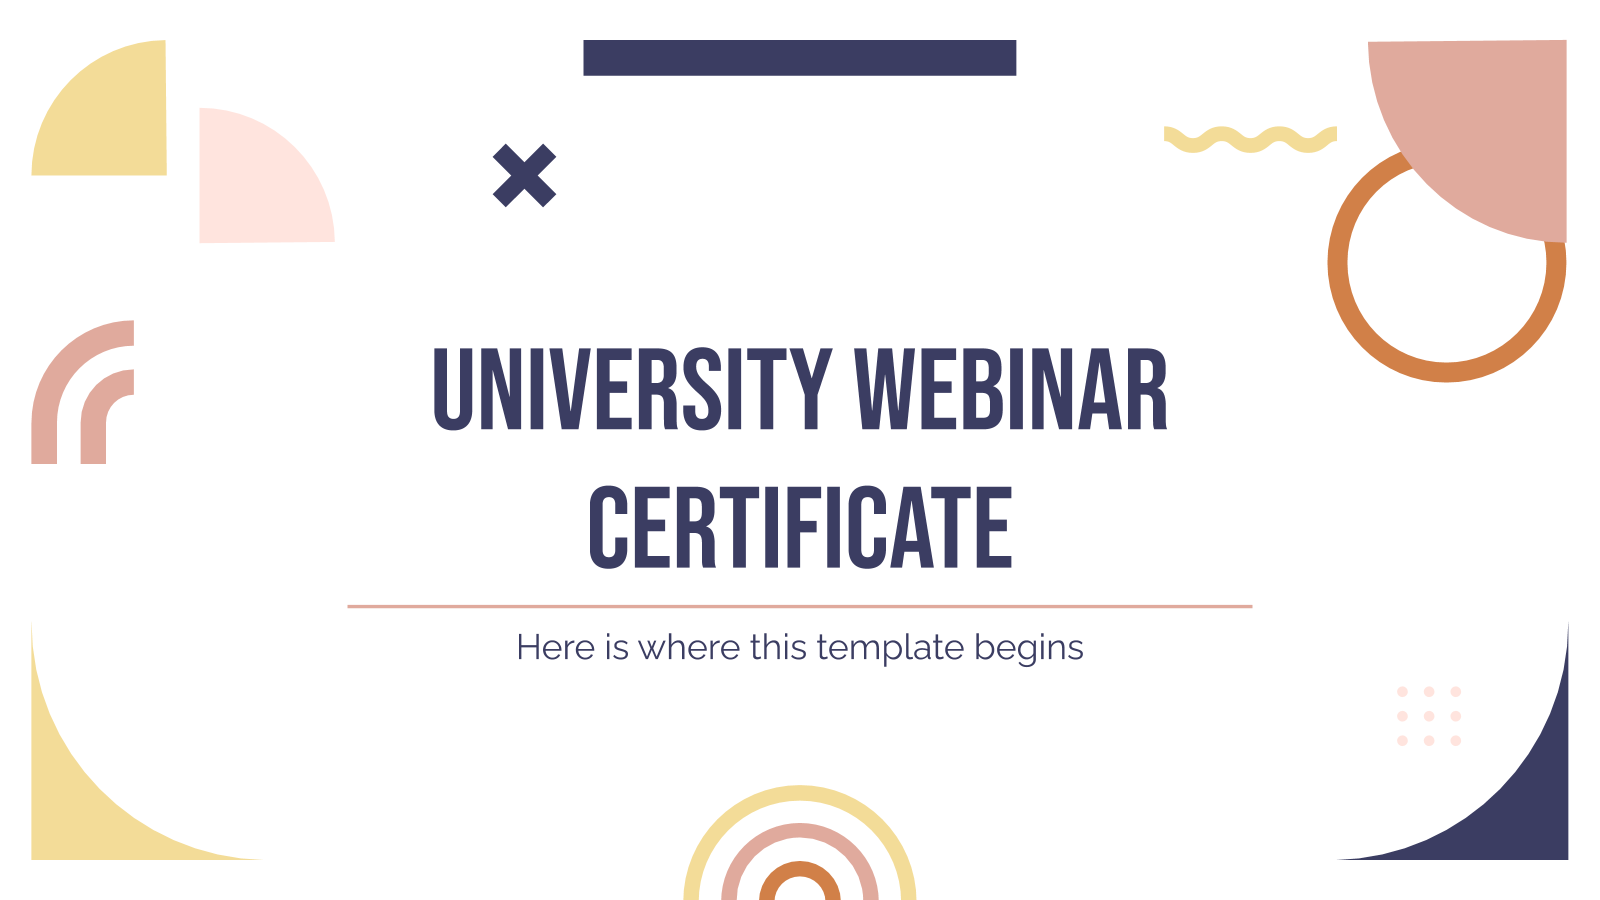 Plantilla de presentación Universität Webinar-Zertifikat